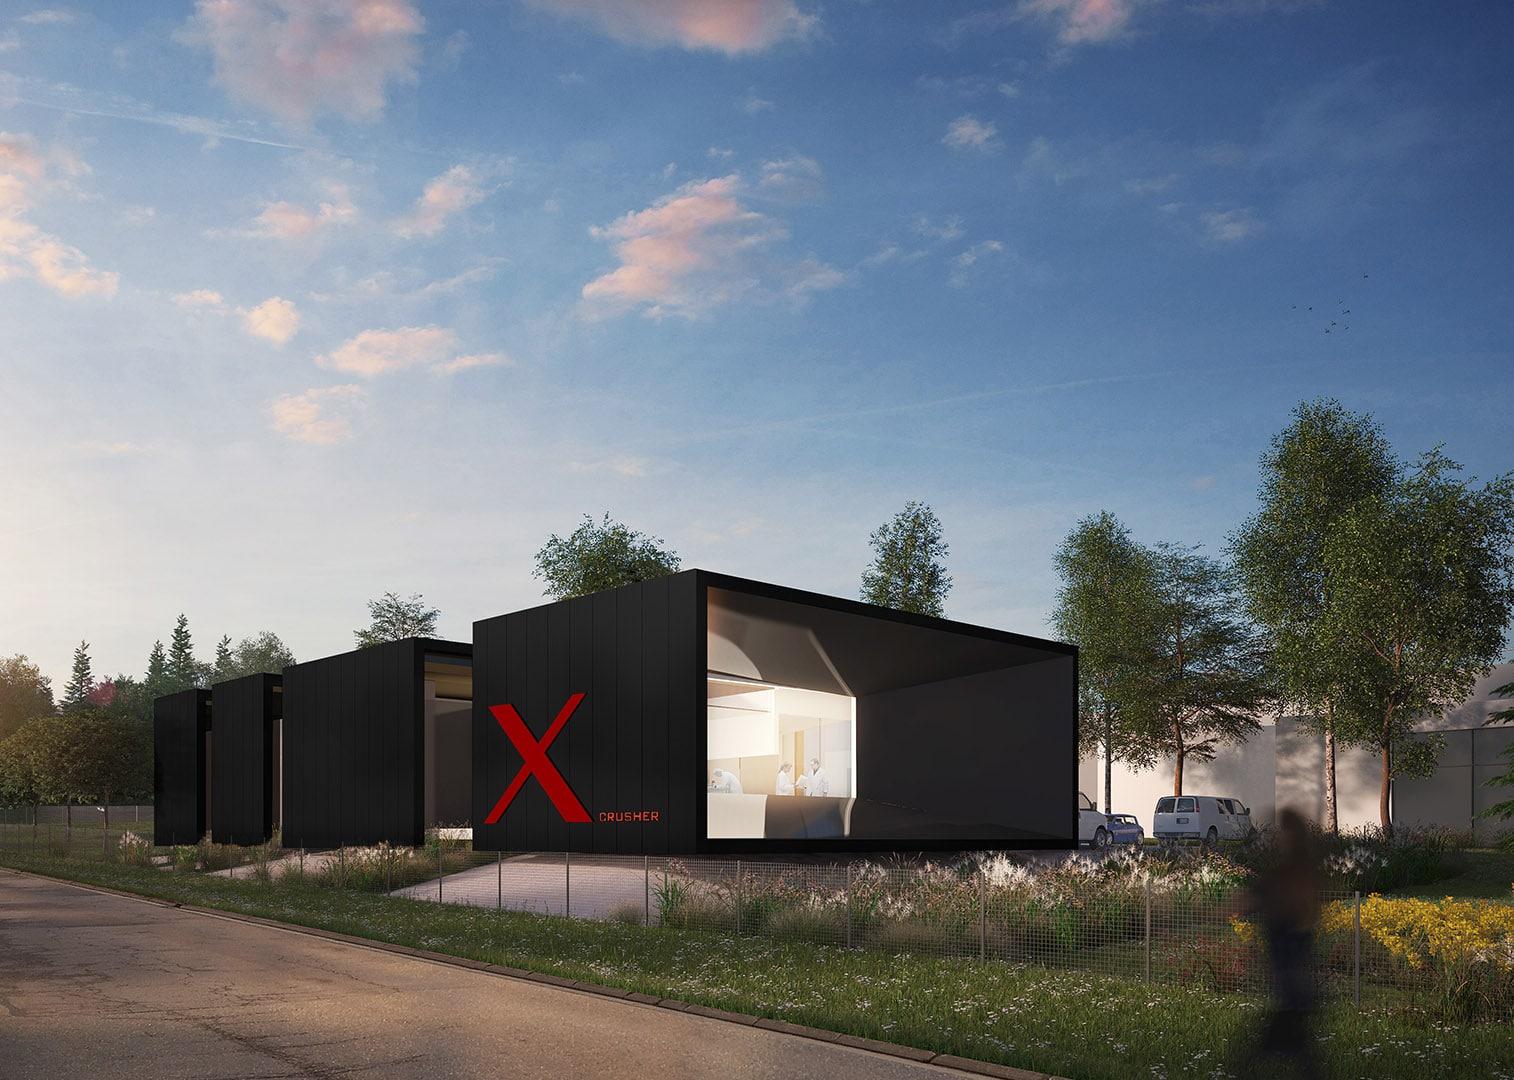 bureaux-laboratoire-xcrusher-val-de-reuil-cba-rouen-1